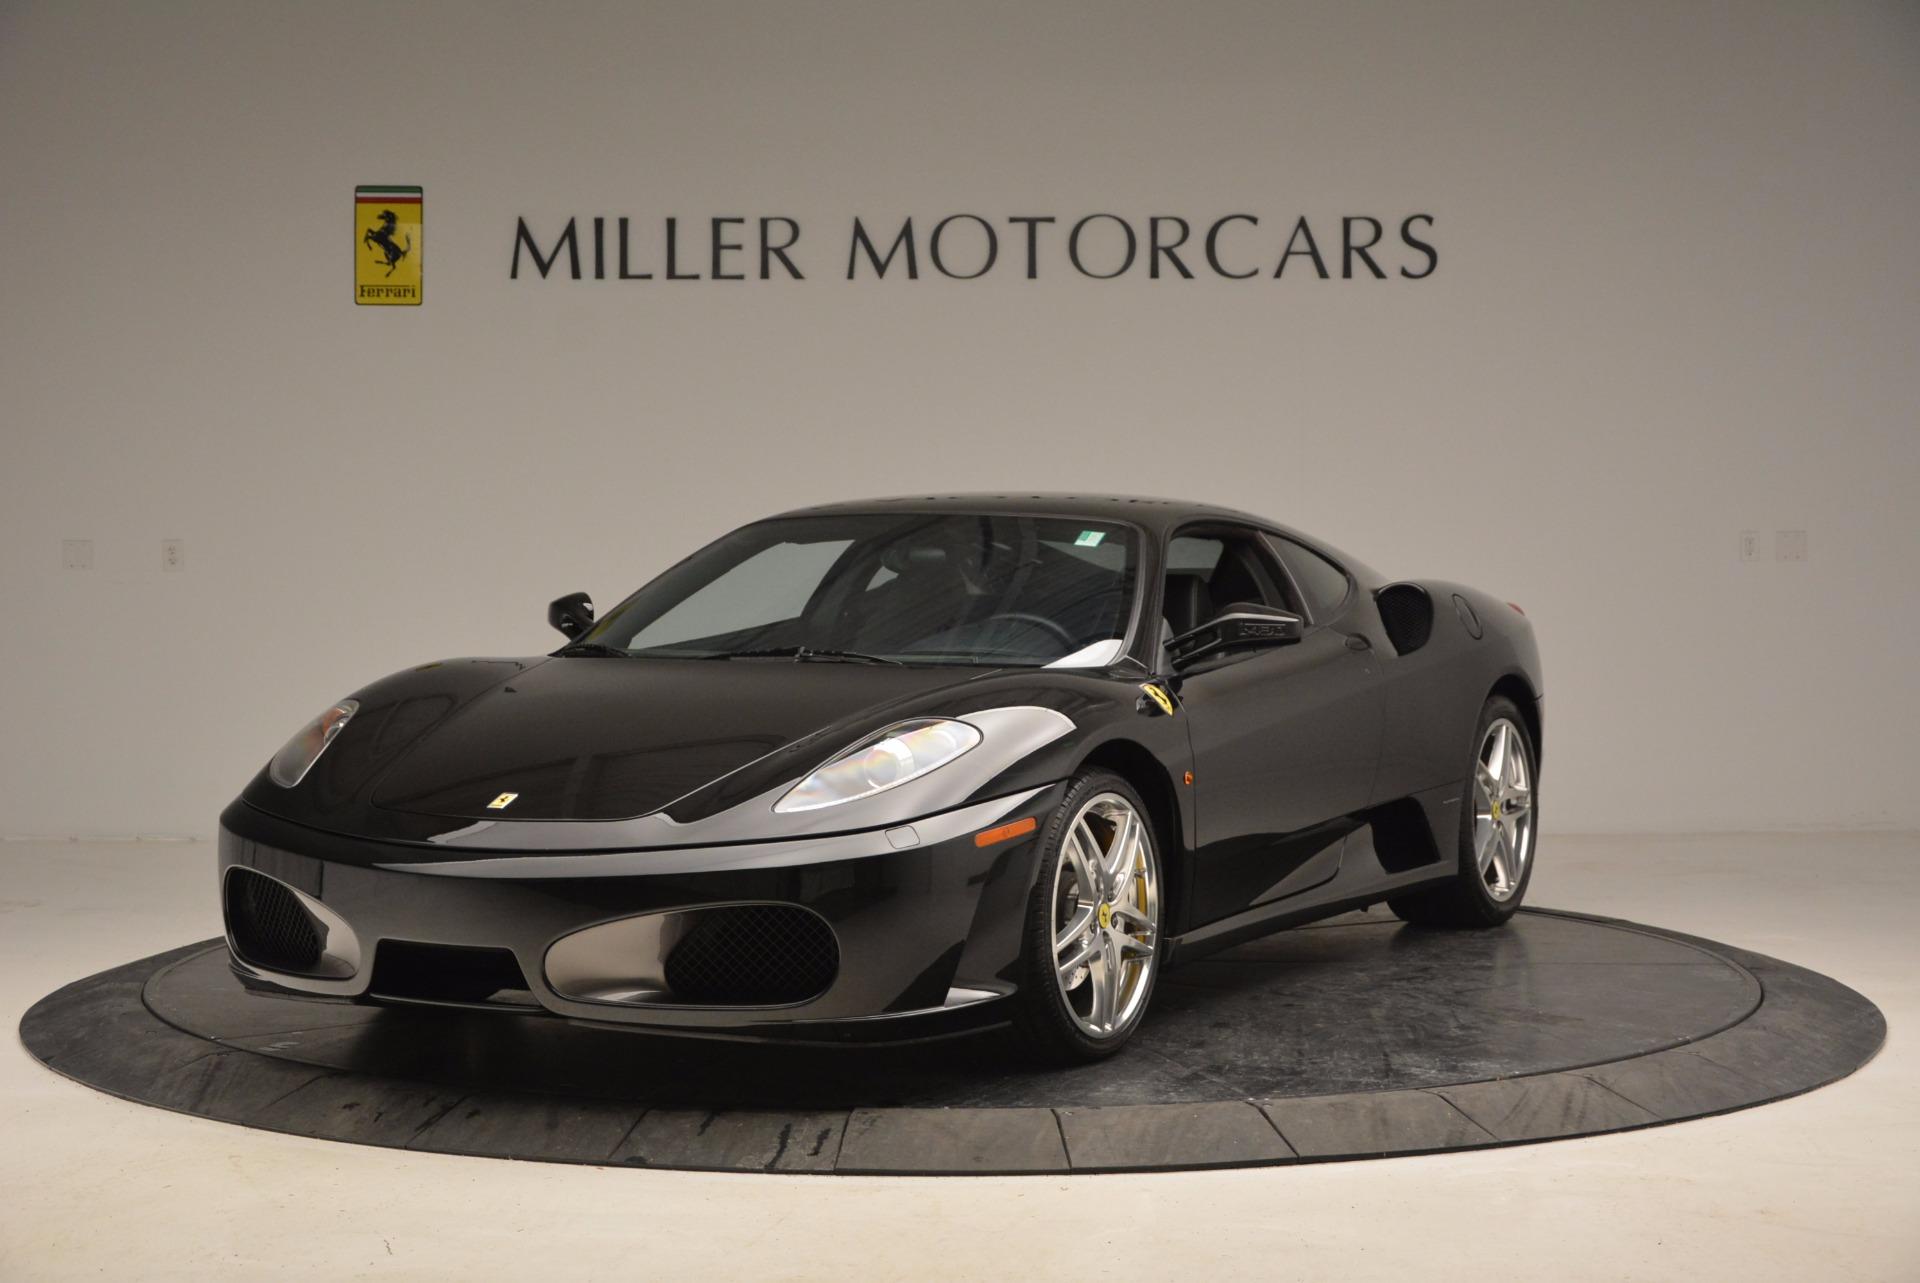 Used 2007 Ferrari F430 F1 for sale Sold at Maserati of Westport in Westport CT 06880 1